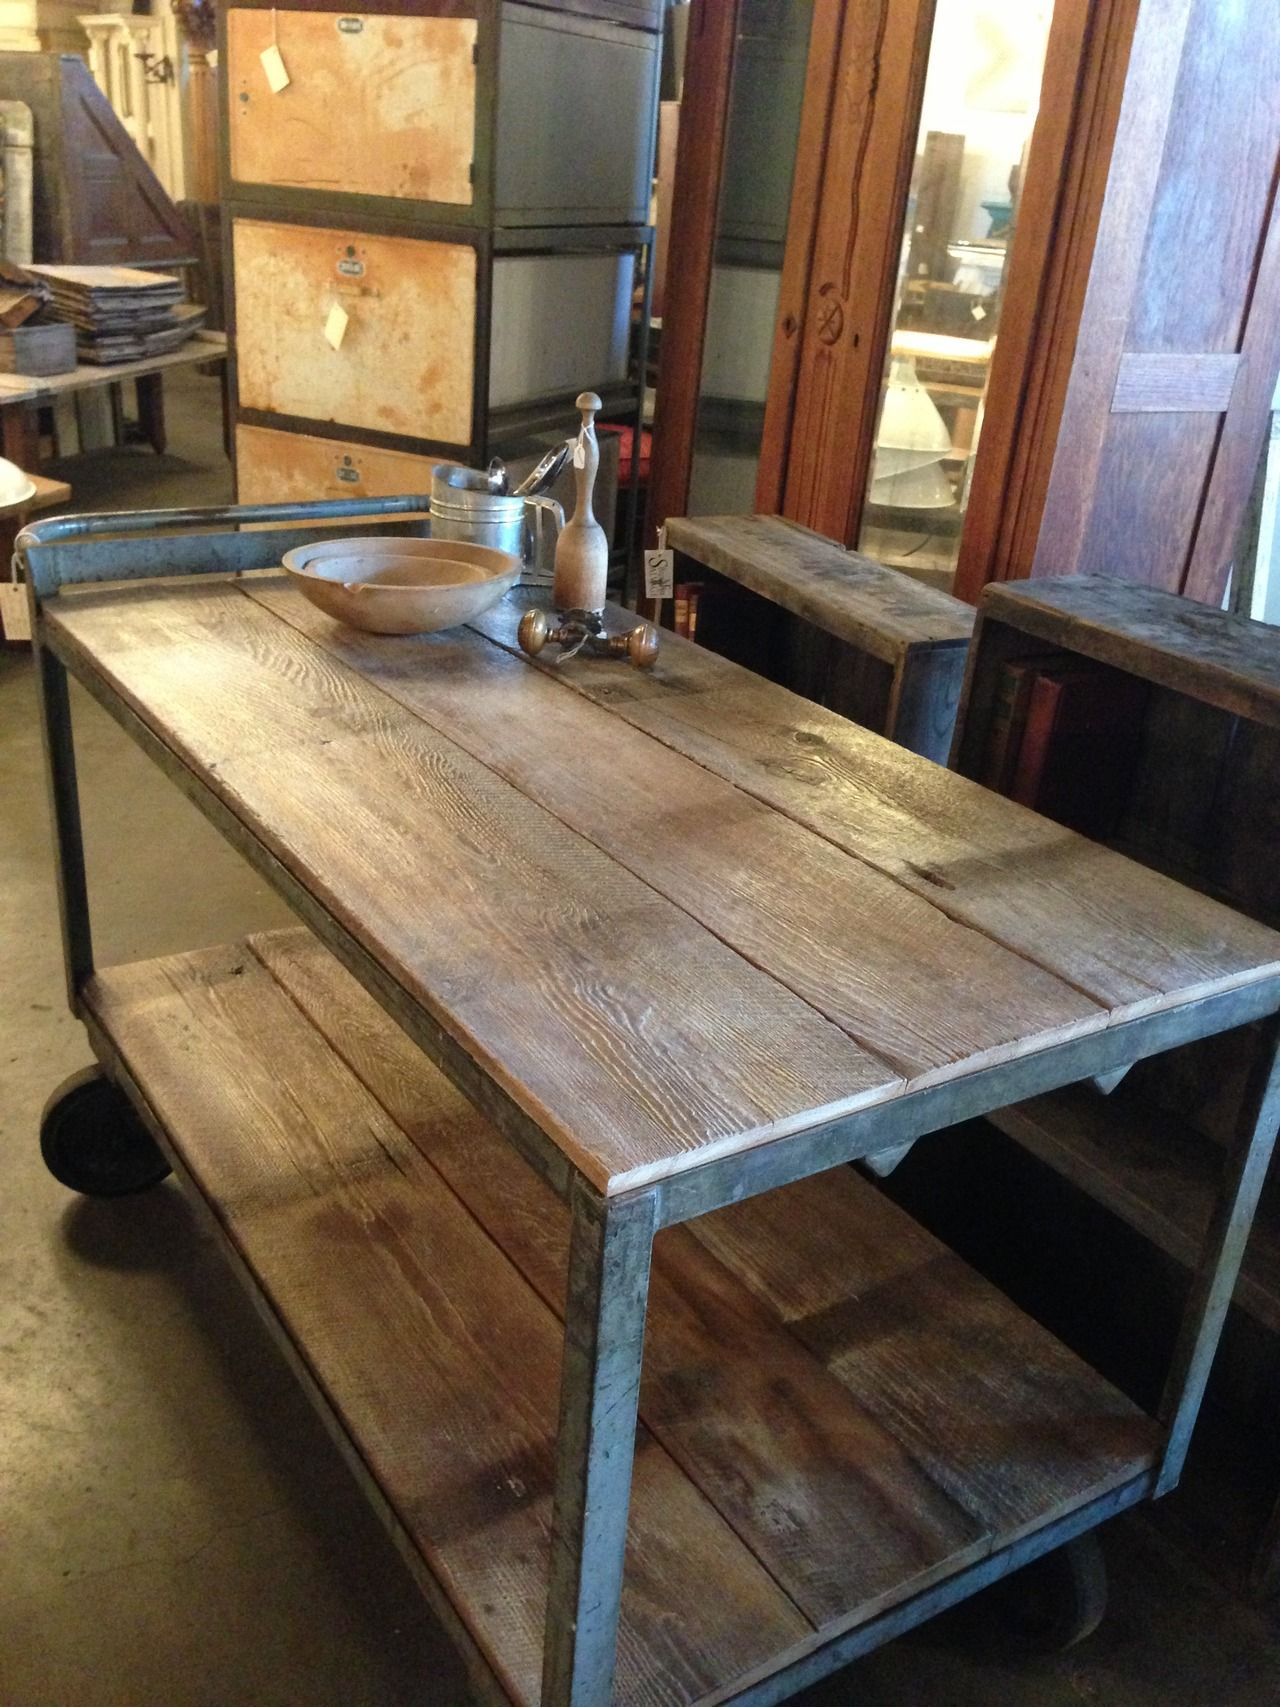 Design Industrial Kitchen Island reclaimed barn wood industrial cart kitchen island from silver fox salvage los angeles